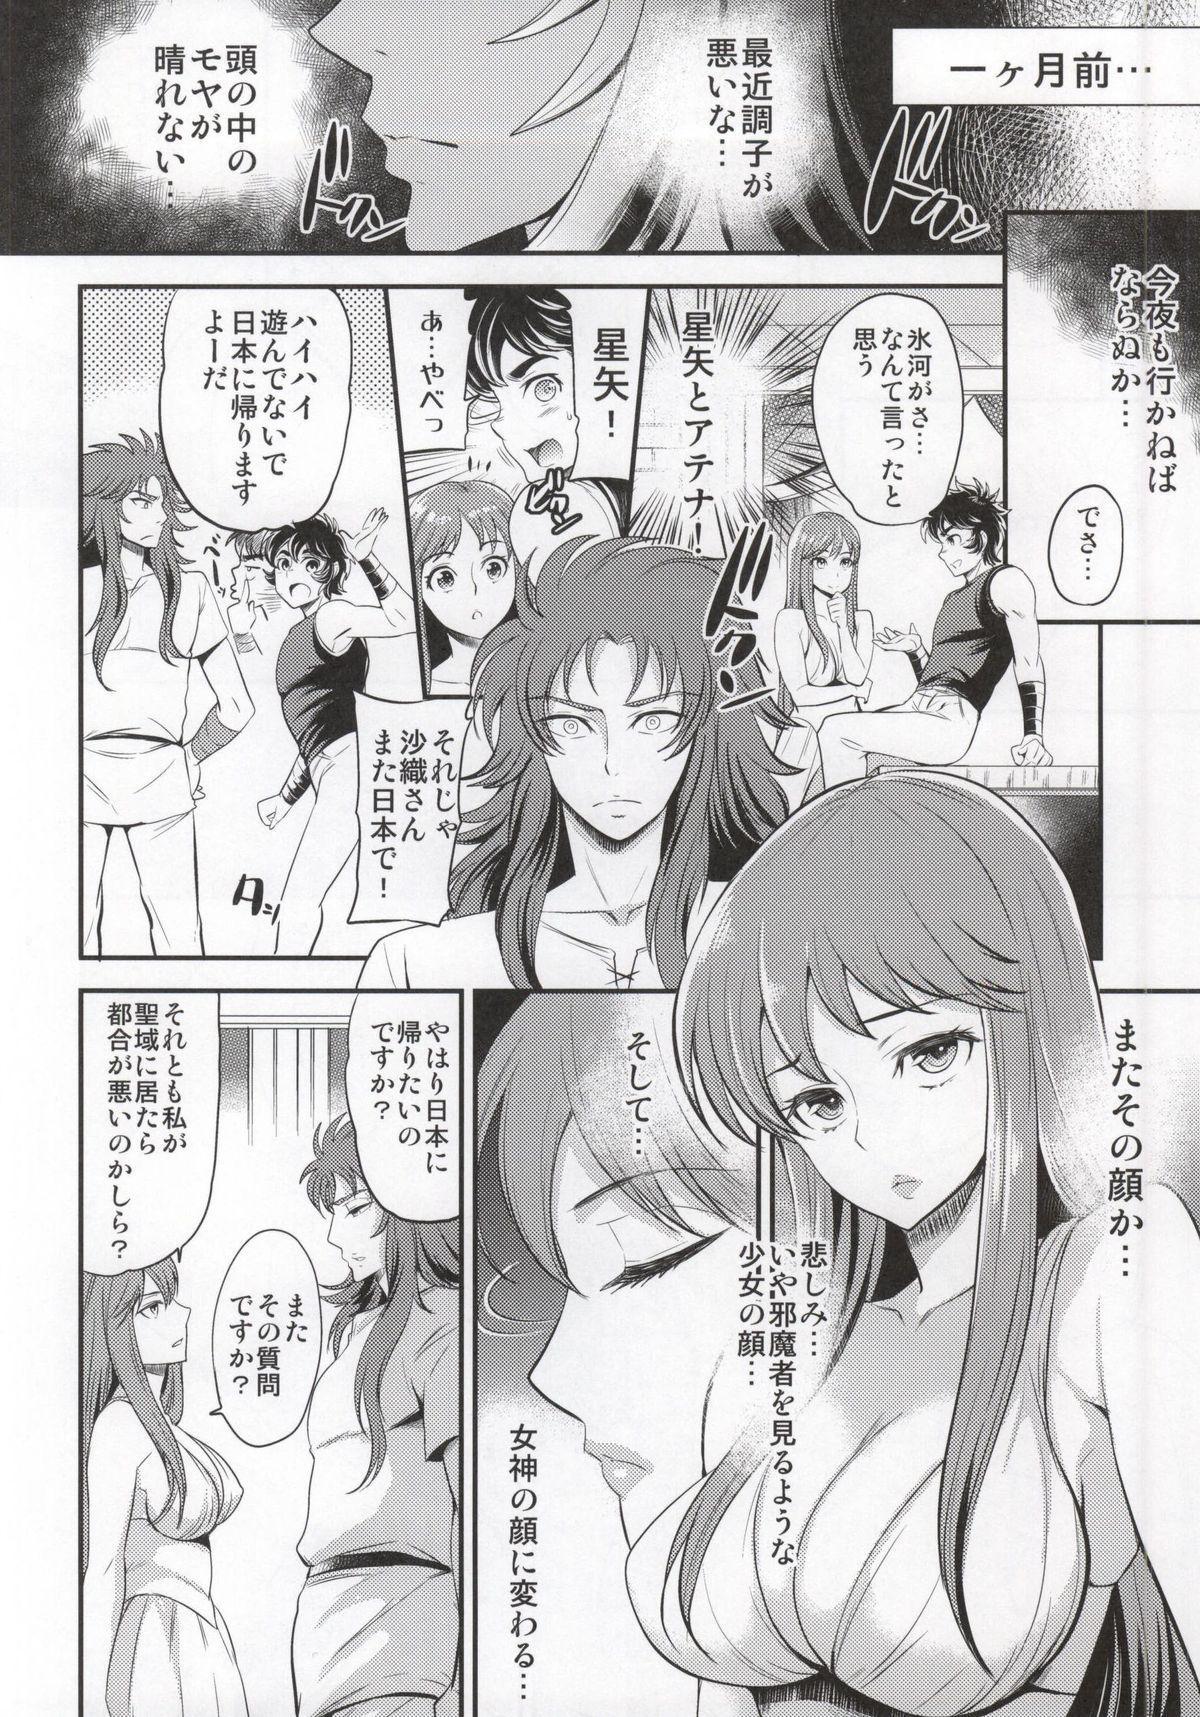 Kago no Naka no Megami 2